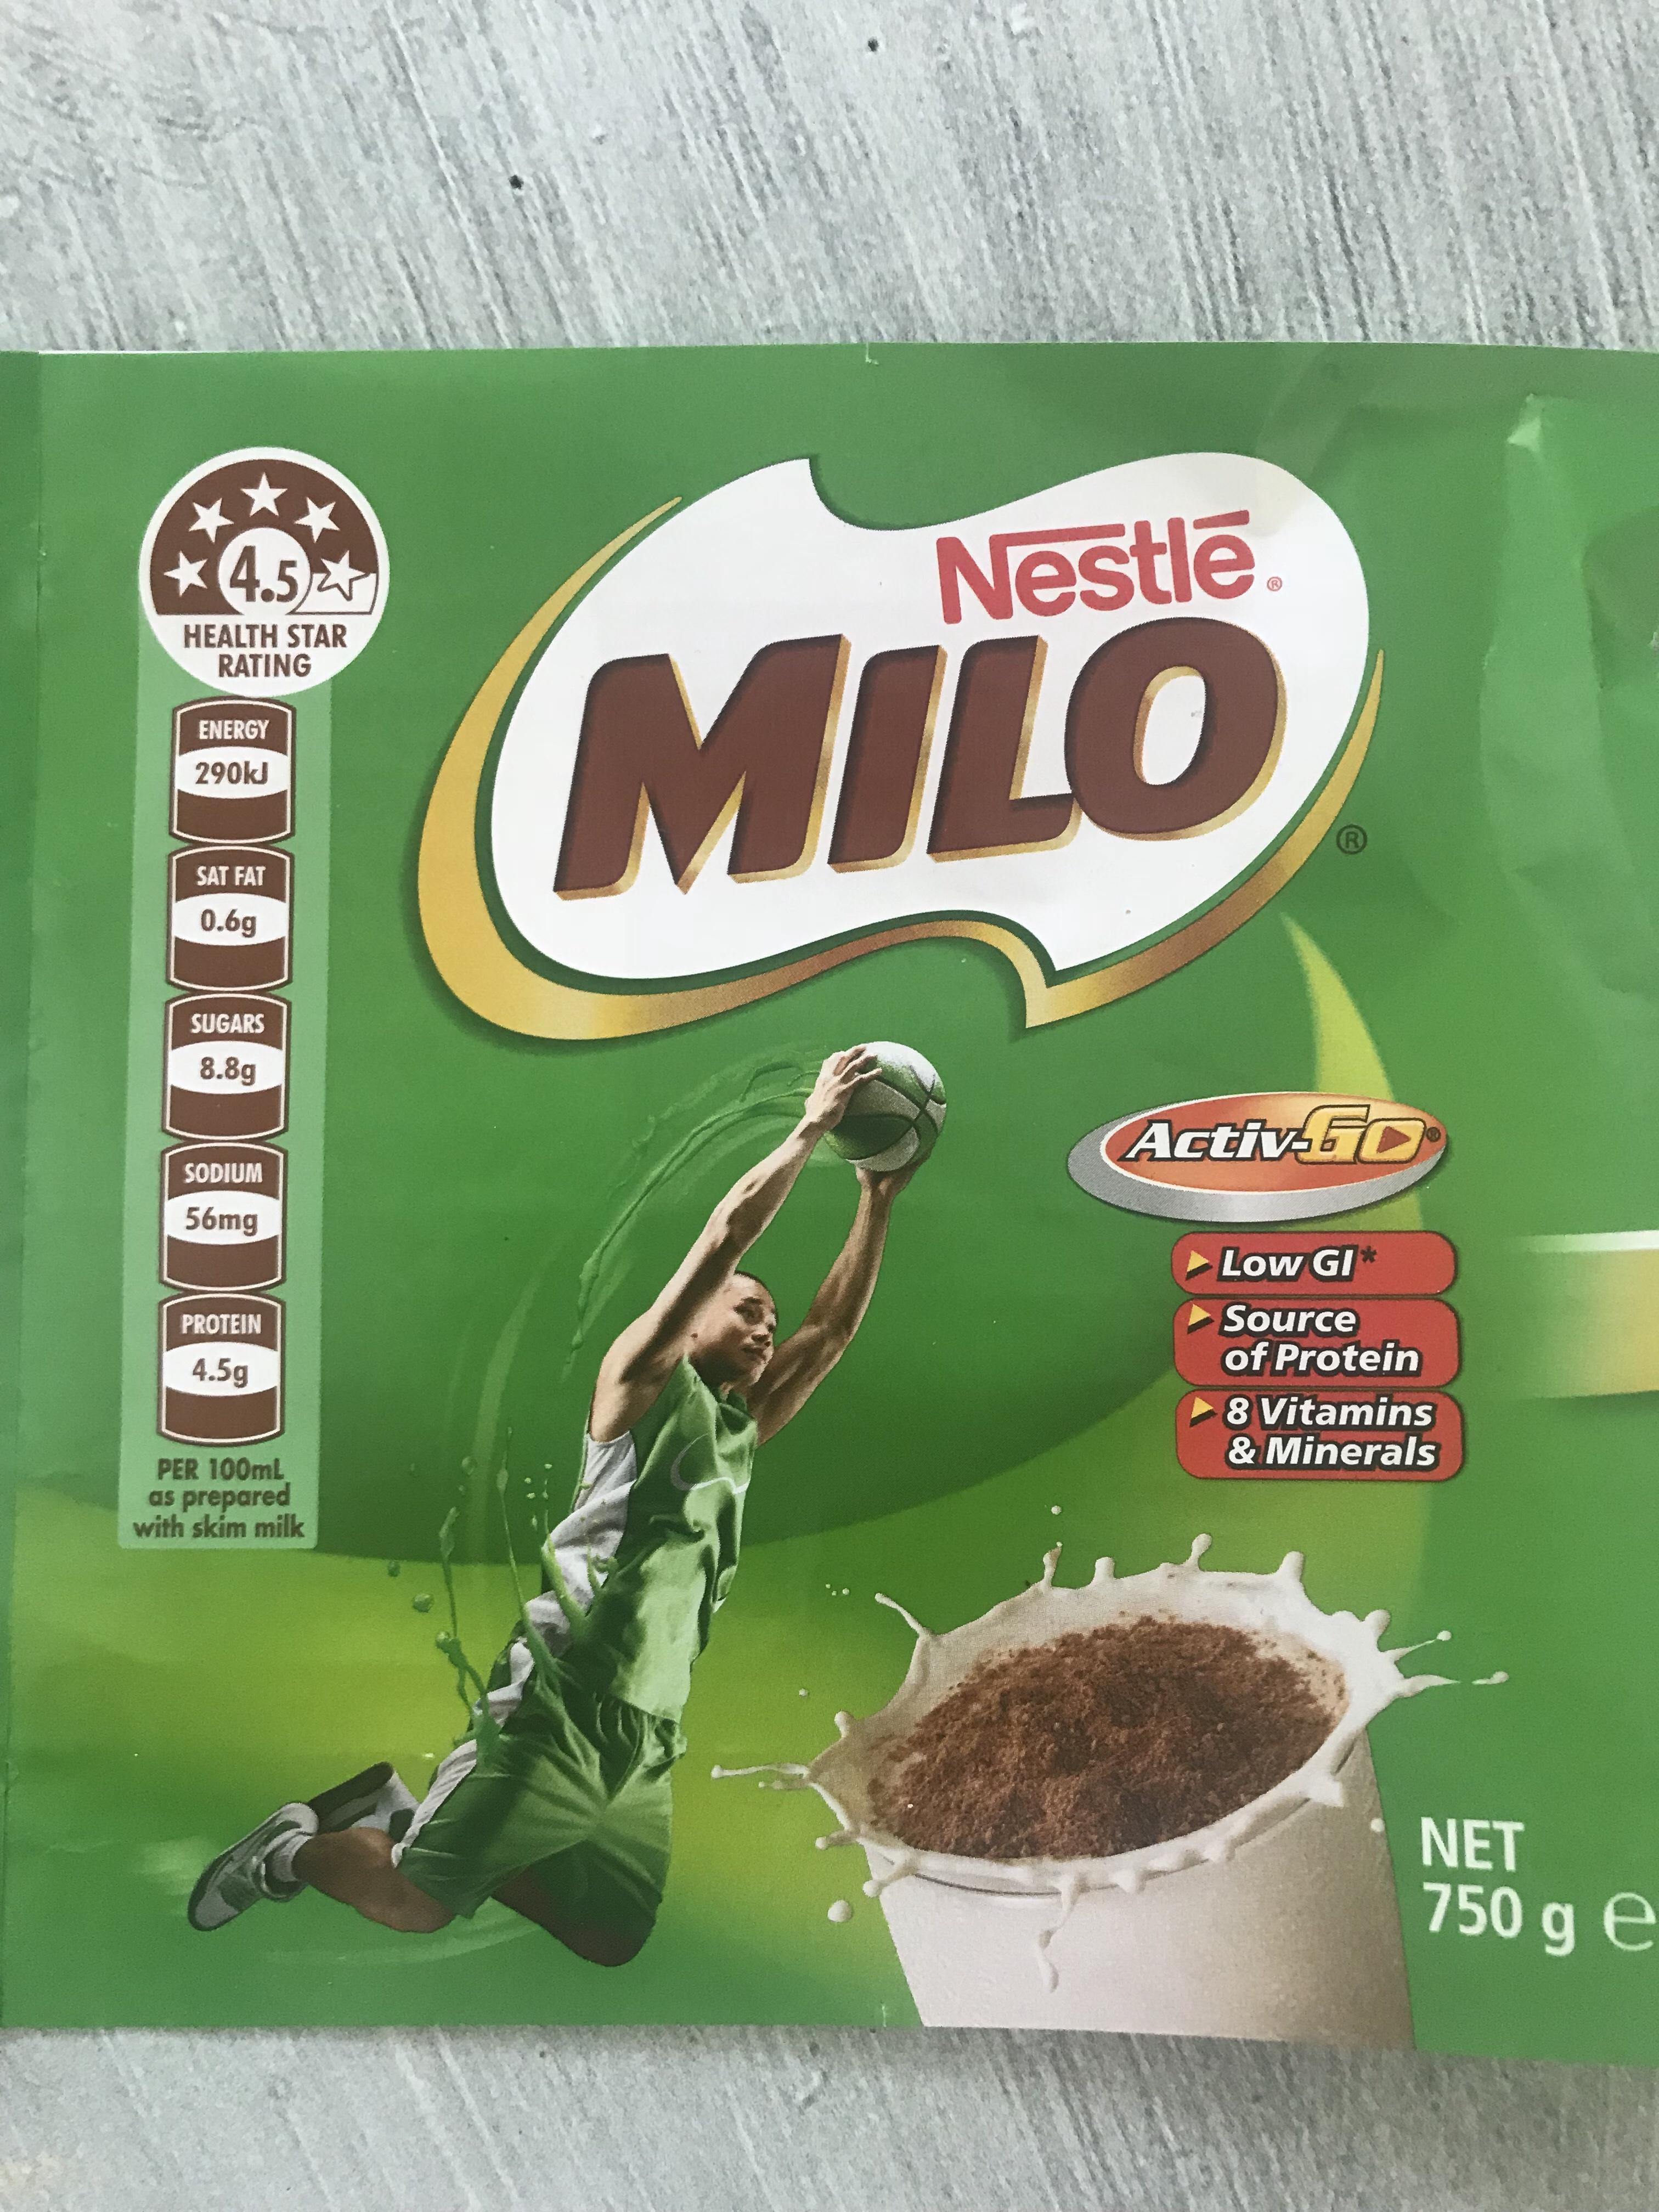 Is Milo healthy?